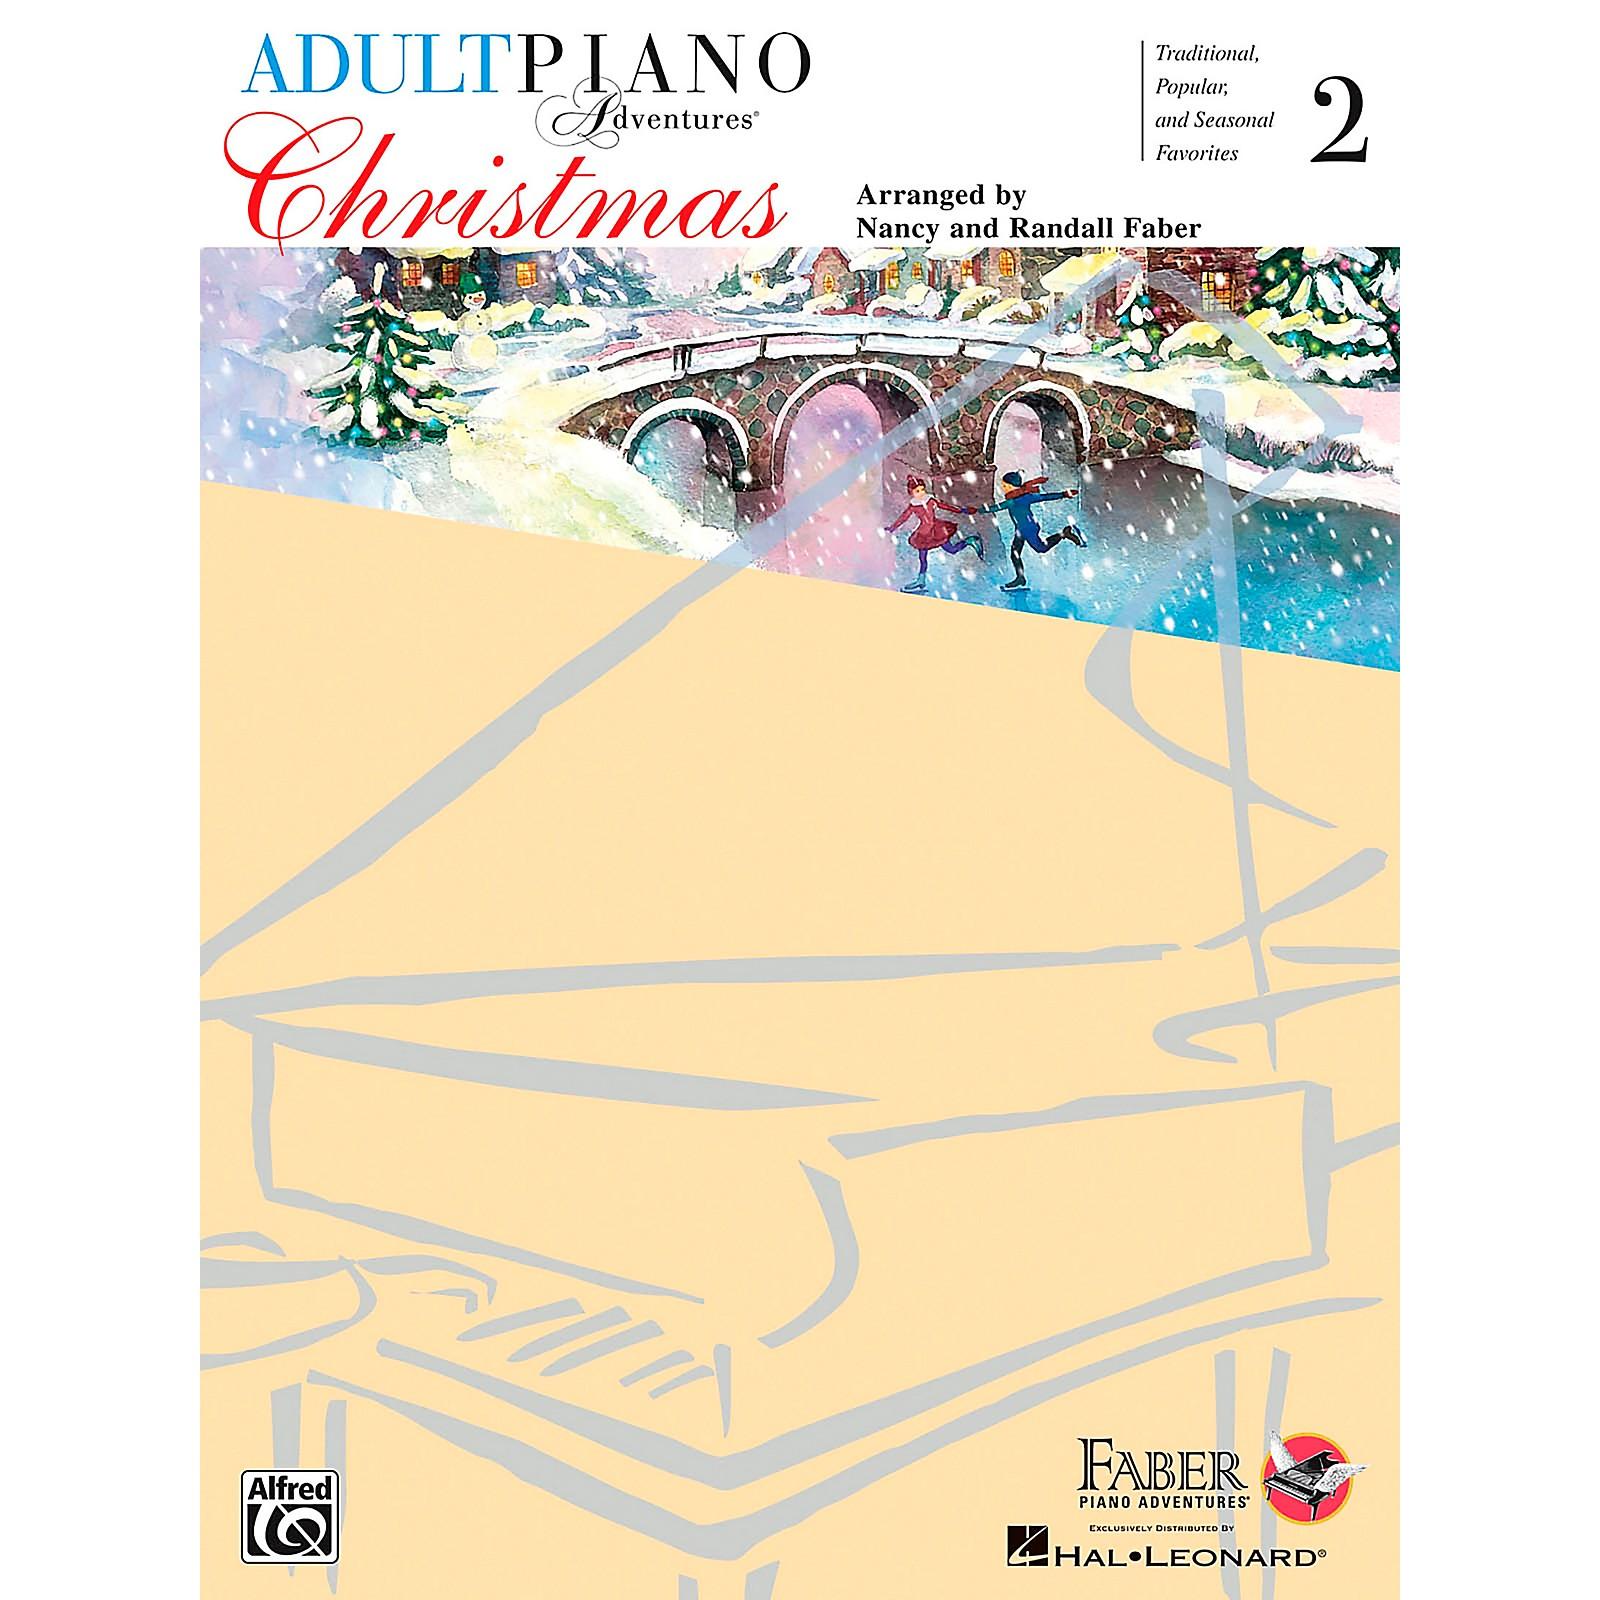 Faber Piano Adventures Adult Piano Adventures - Christmas Book 2